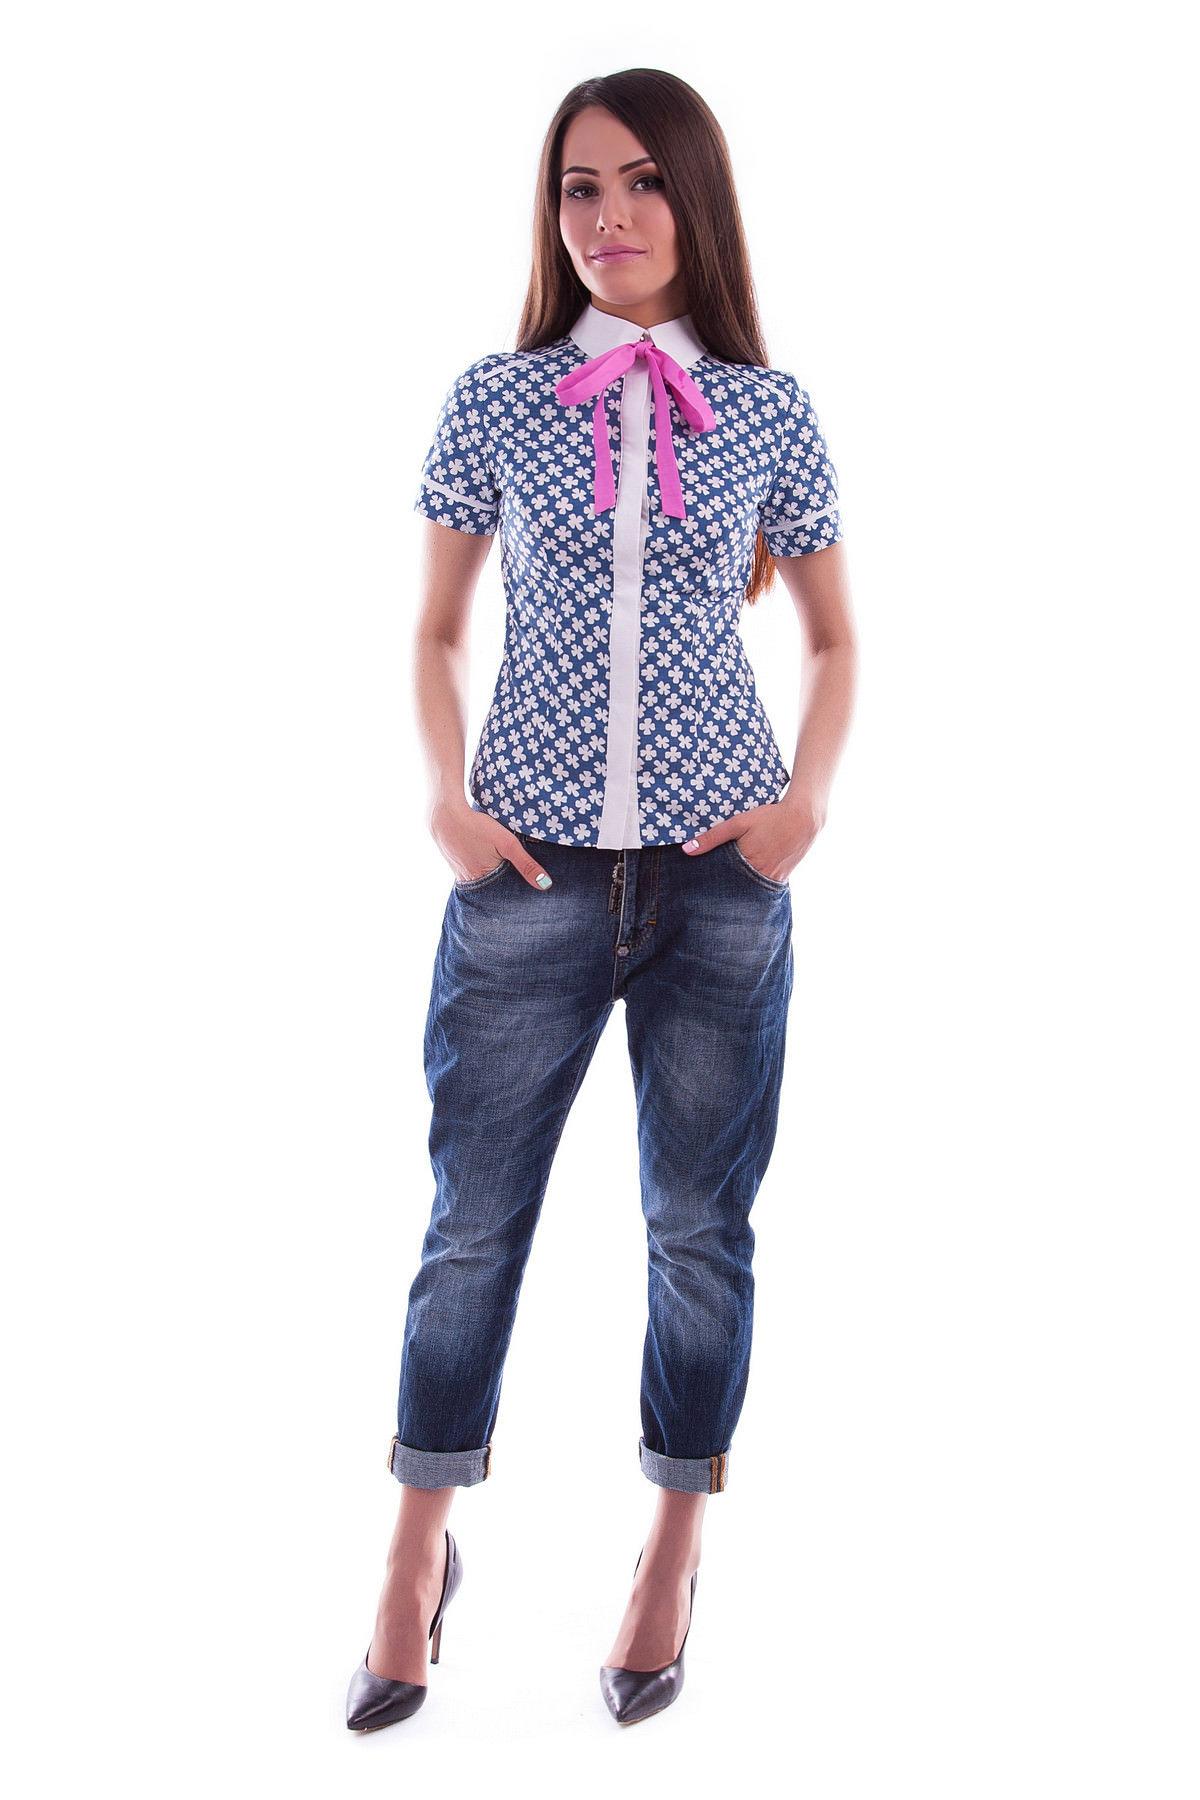 Стрейч блузки